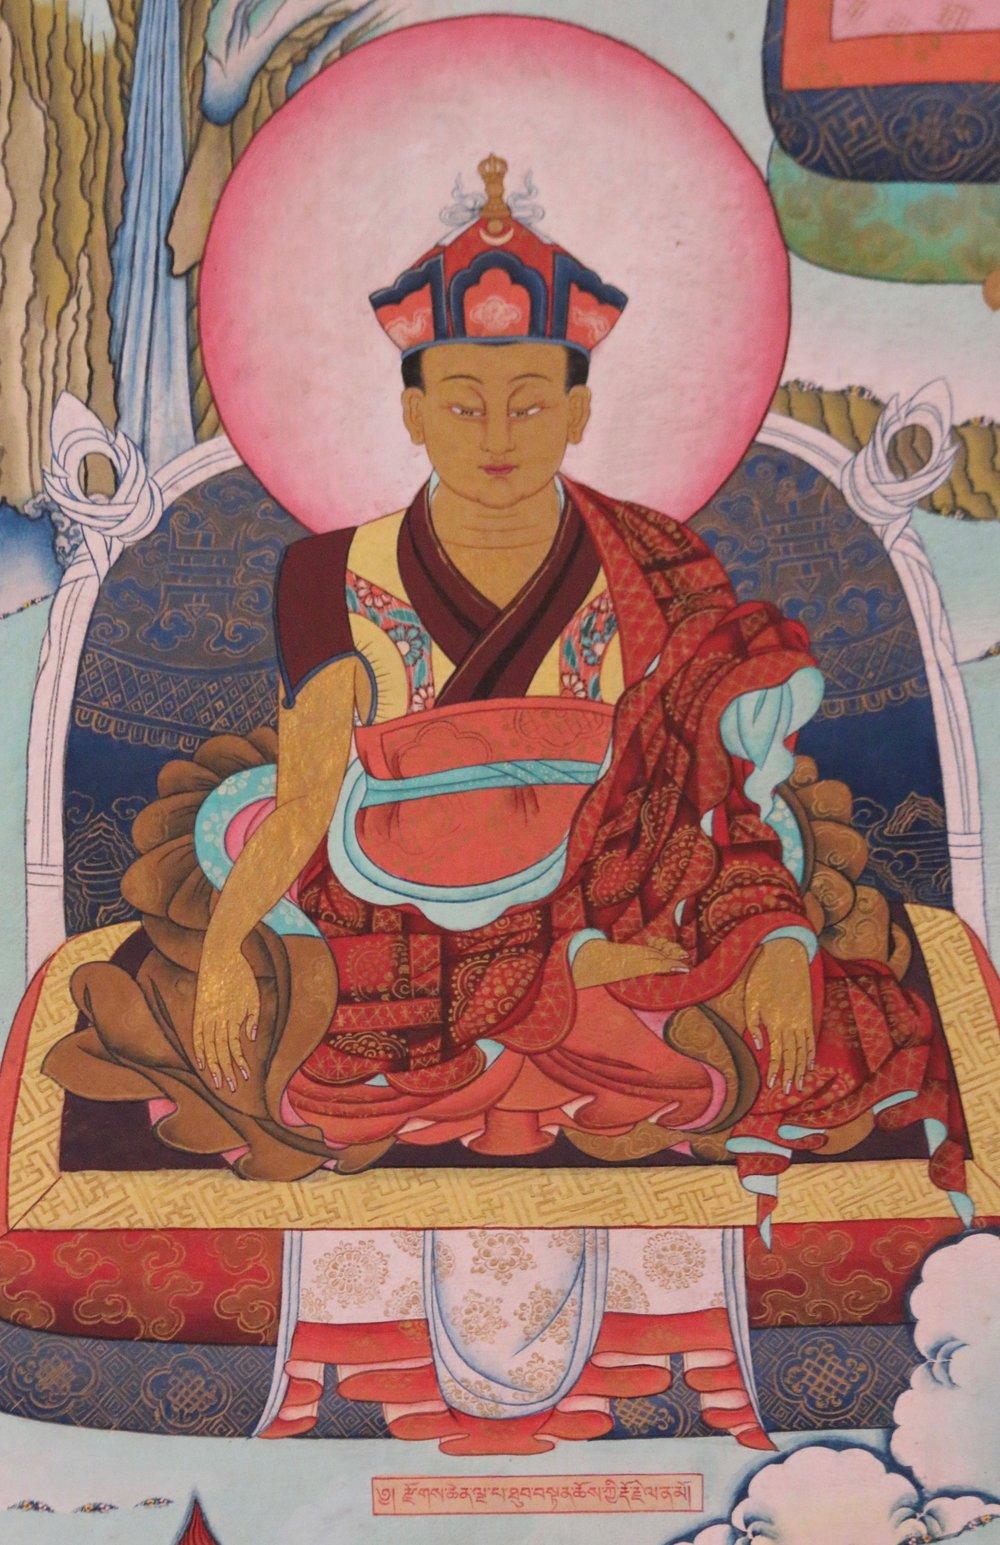 5th Dzogchen Thubten Chokyi Dorje